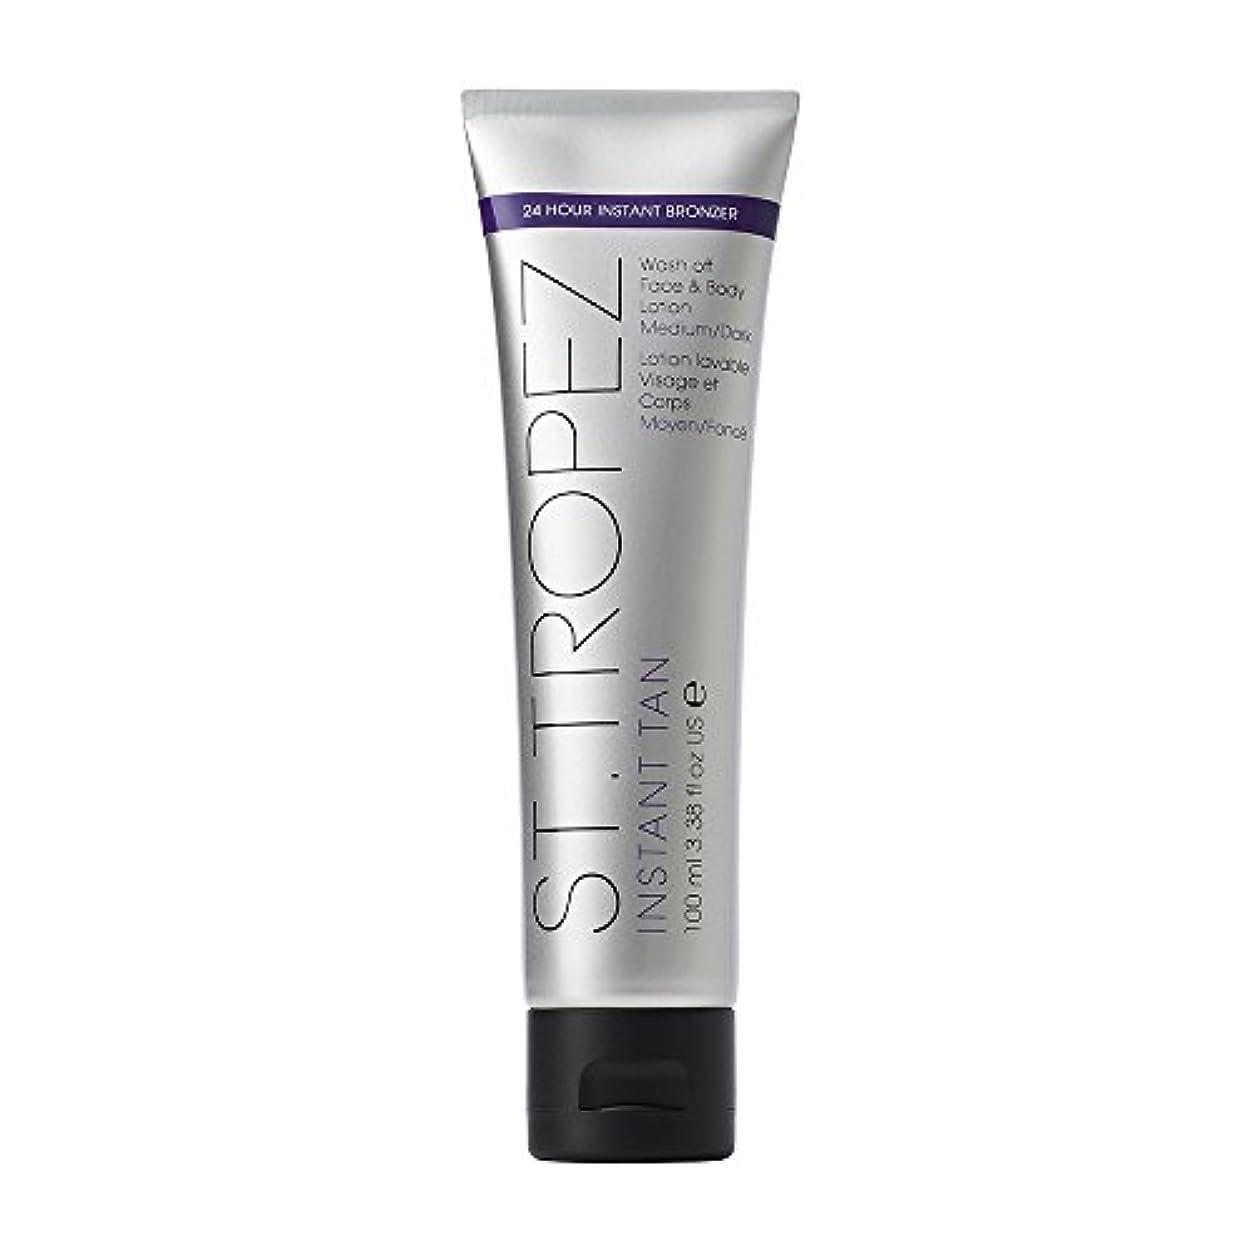 St Tropez Instant Tan Wash Off Face & Body Lotion 100ml Medium/Dark / ???????????????????????????????????100??...